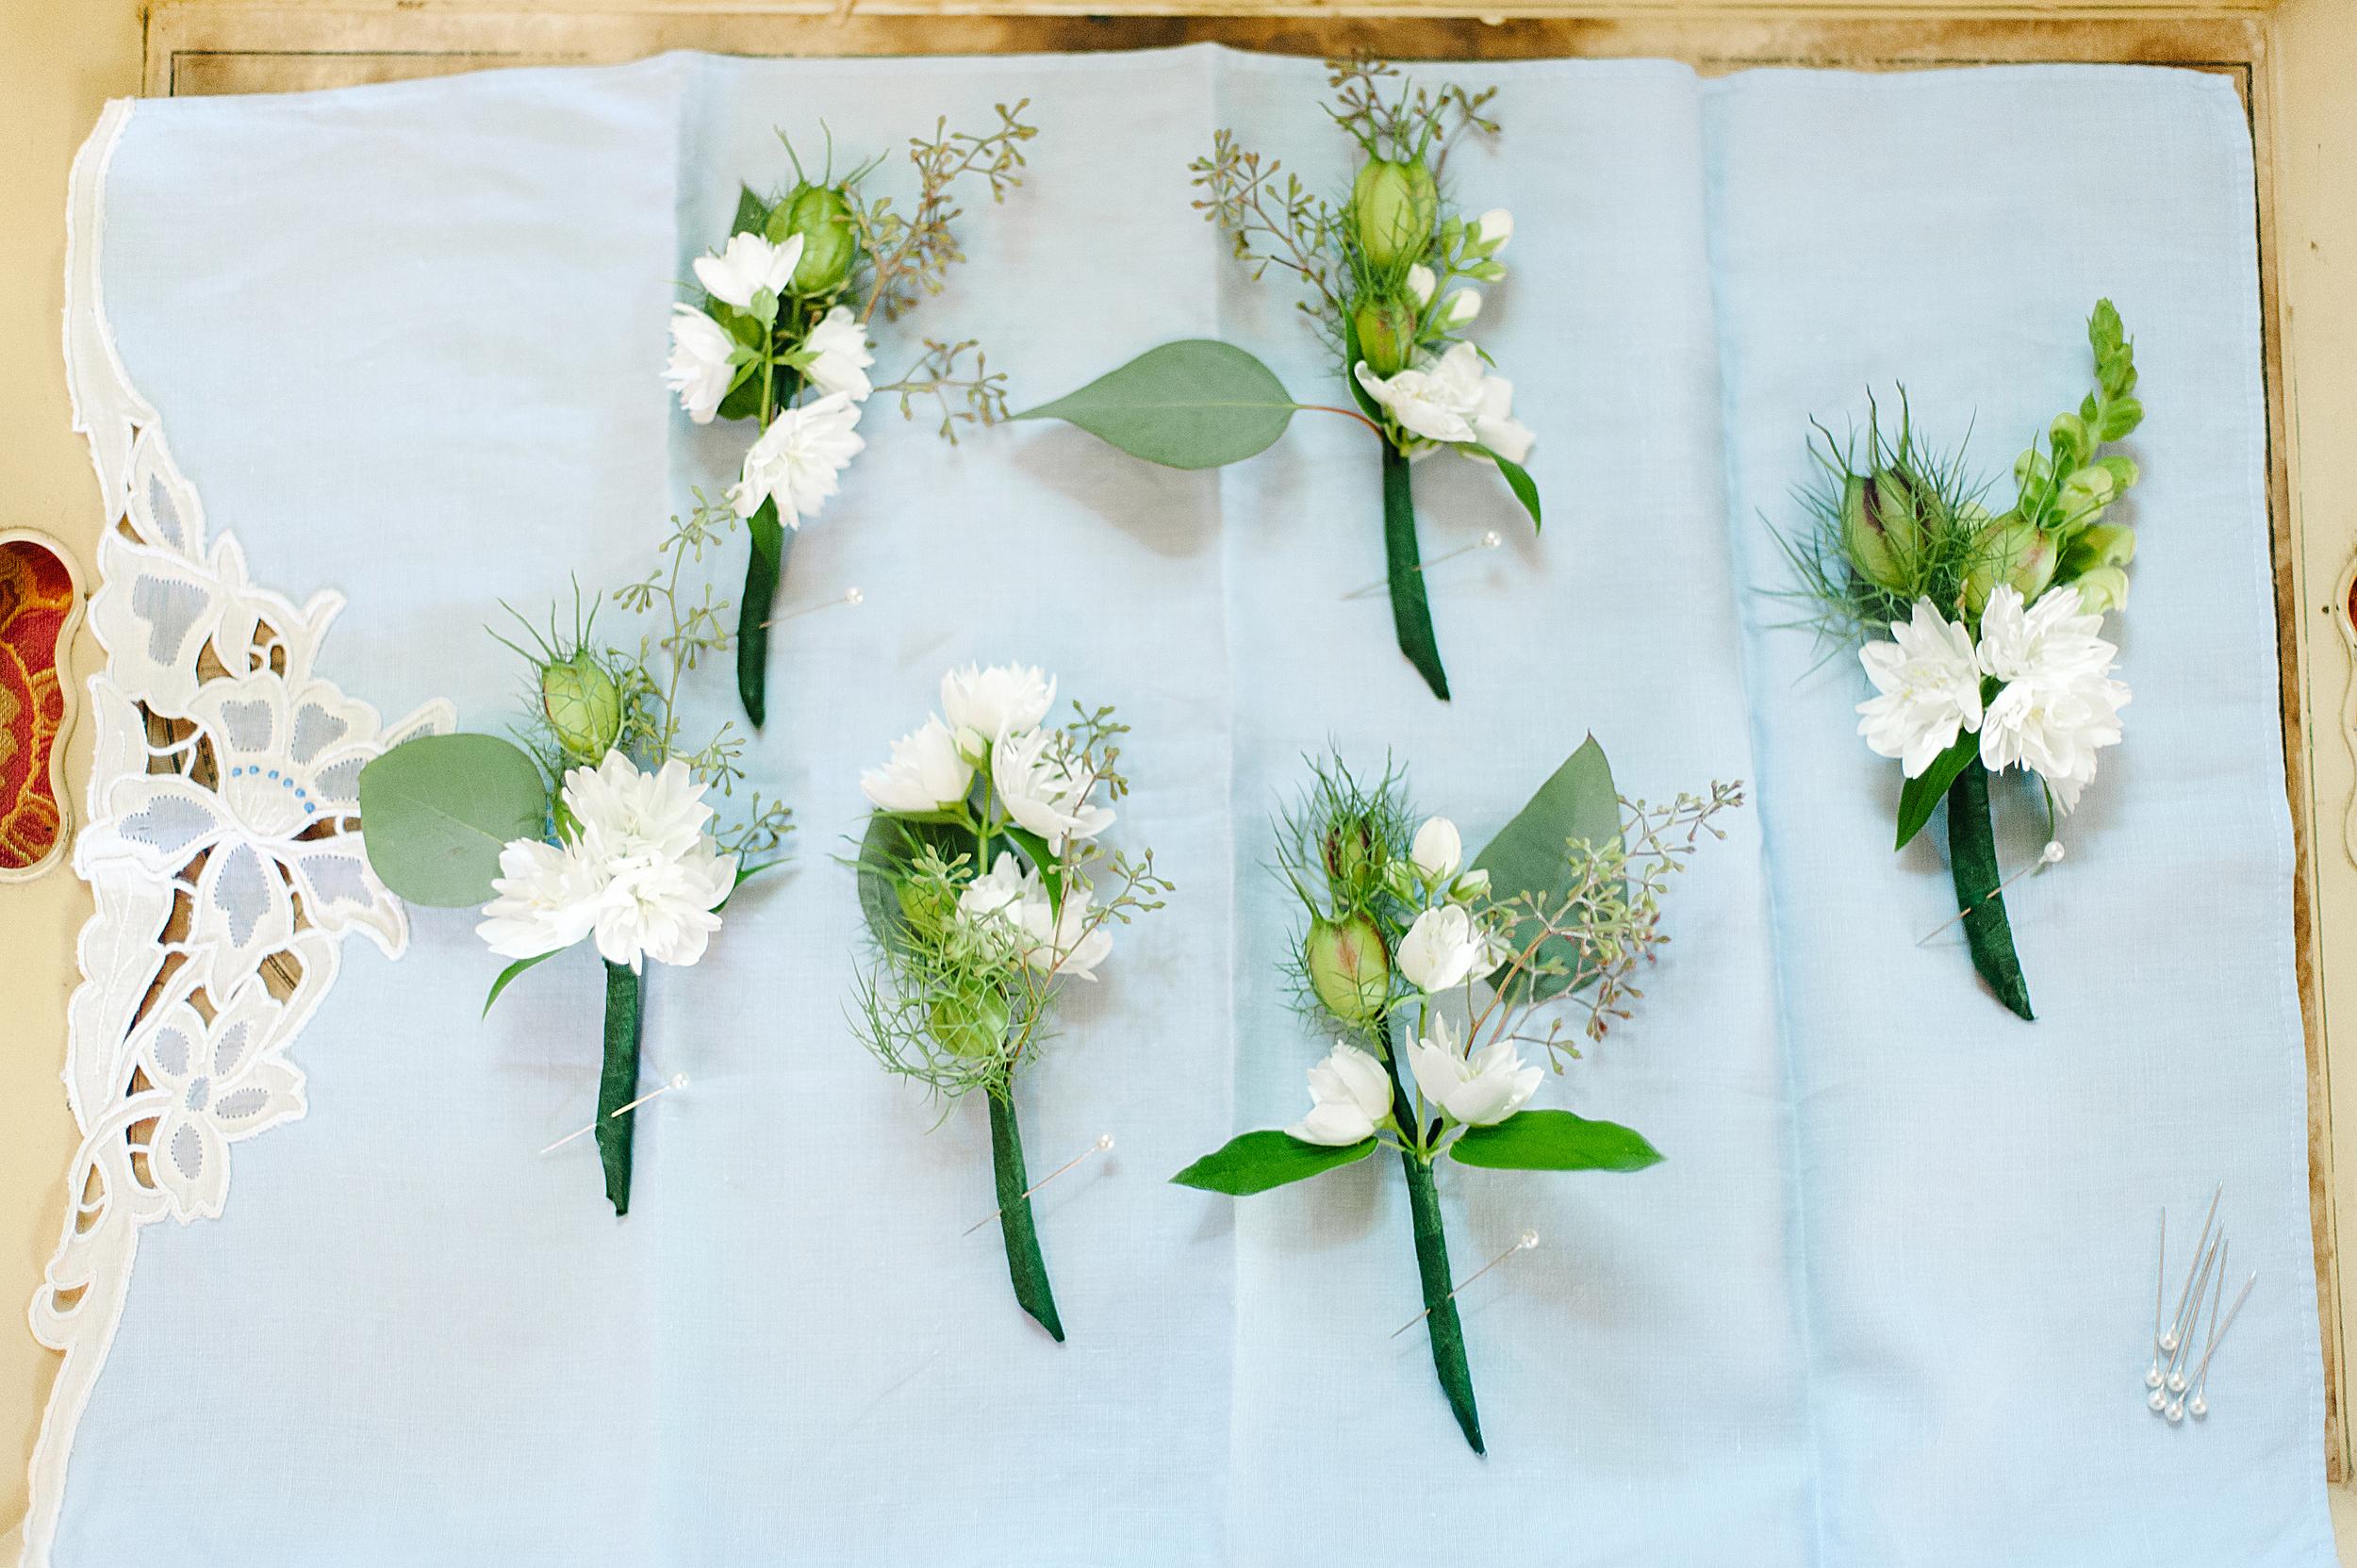 Boutonnieres featured Nigella, fragrant mock orange, and seeded eucalyptus.